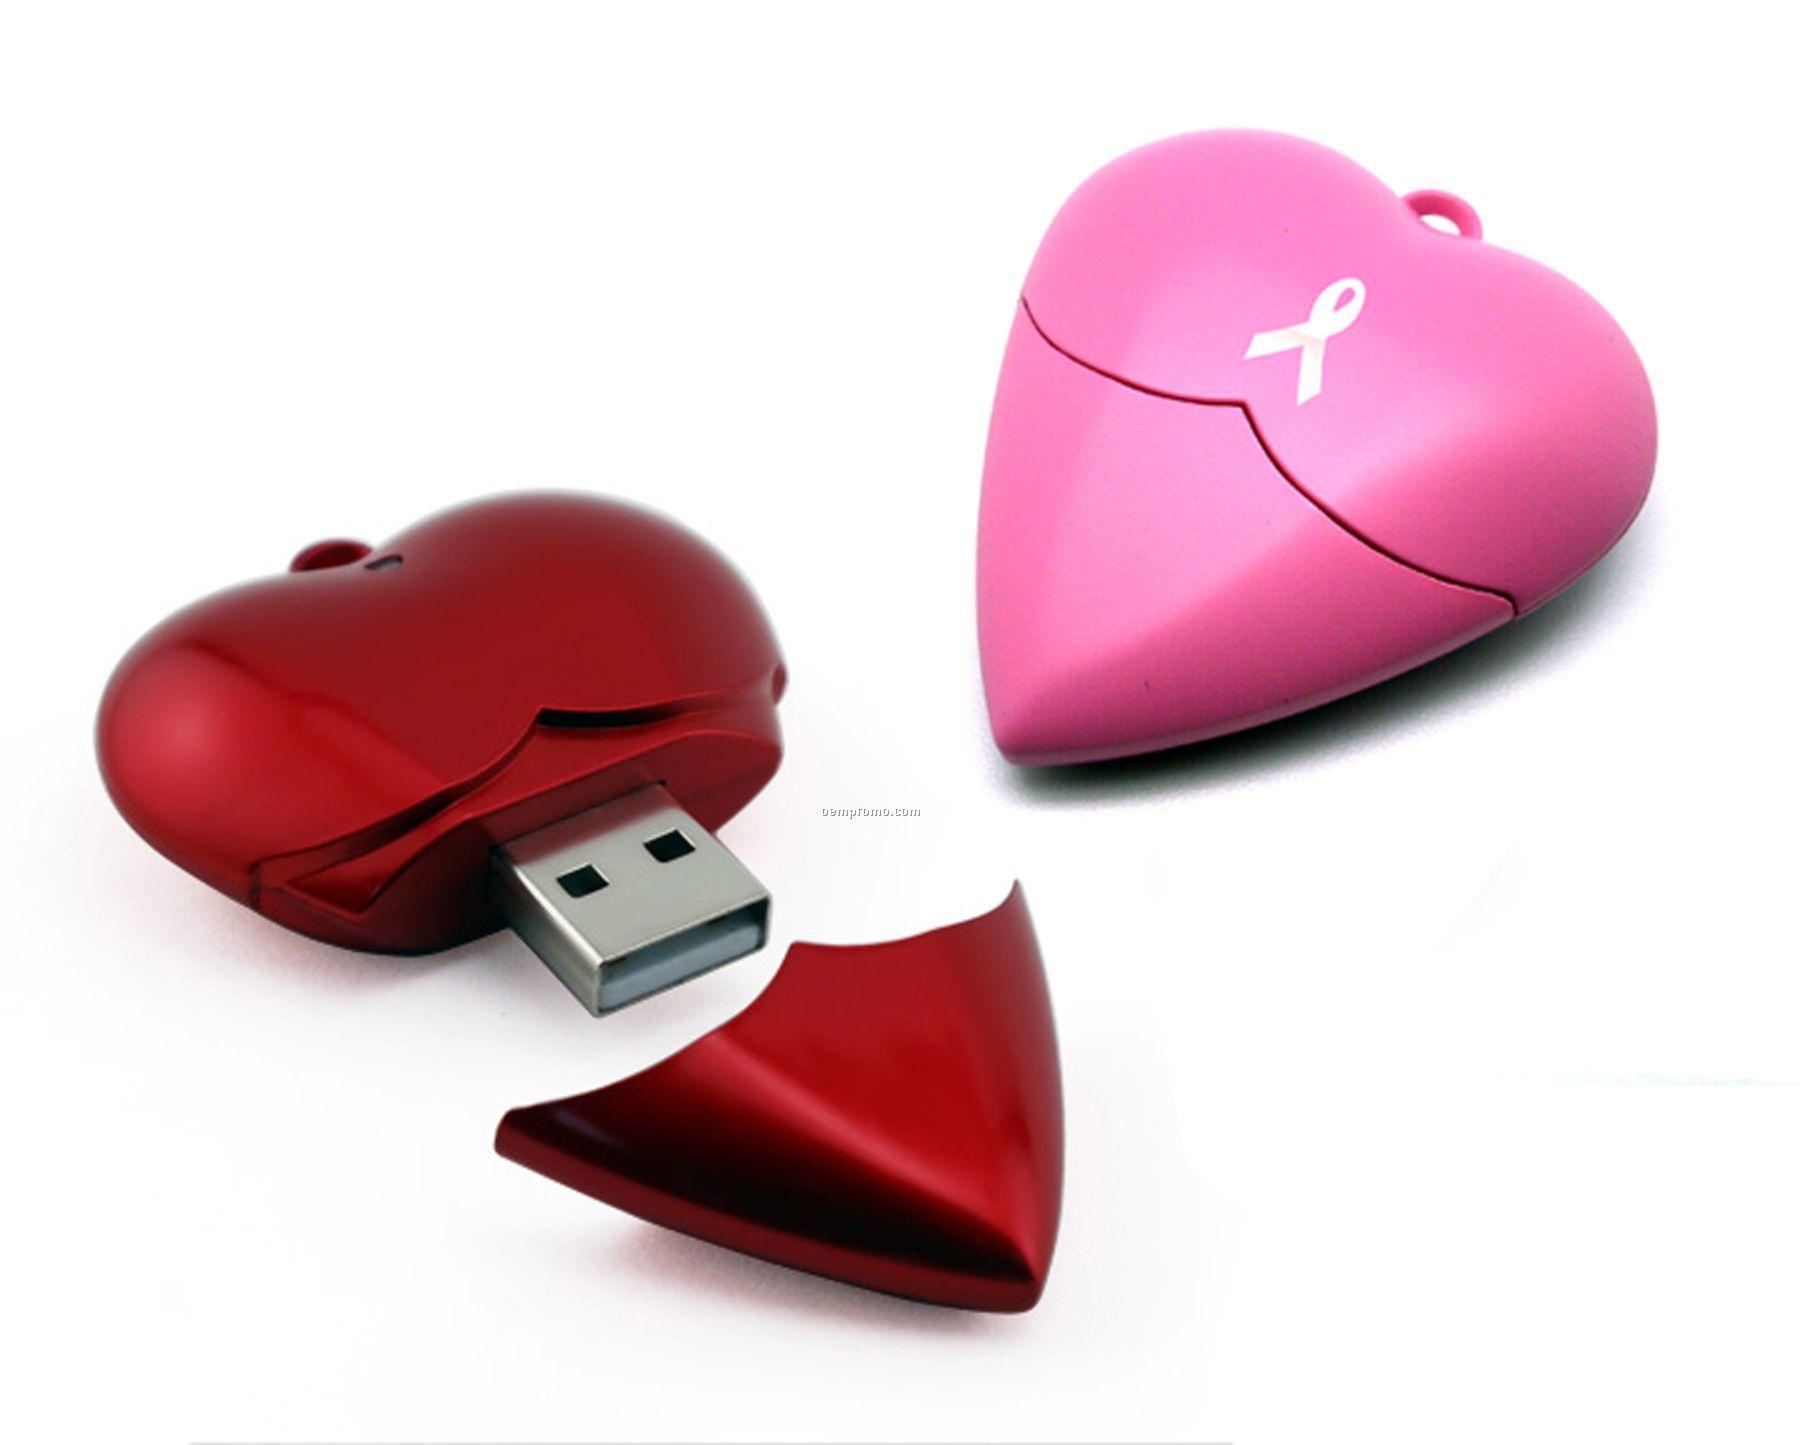 4 Gb Specialty 900r Series USB Drive - Heart